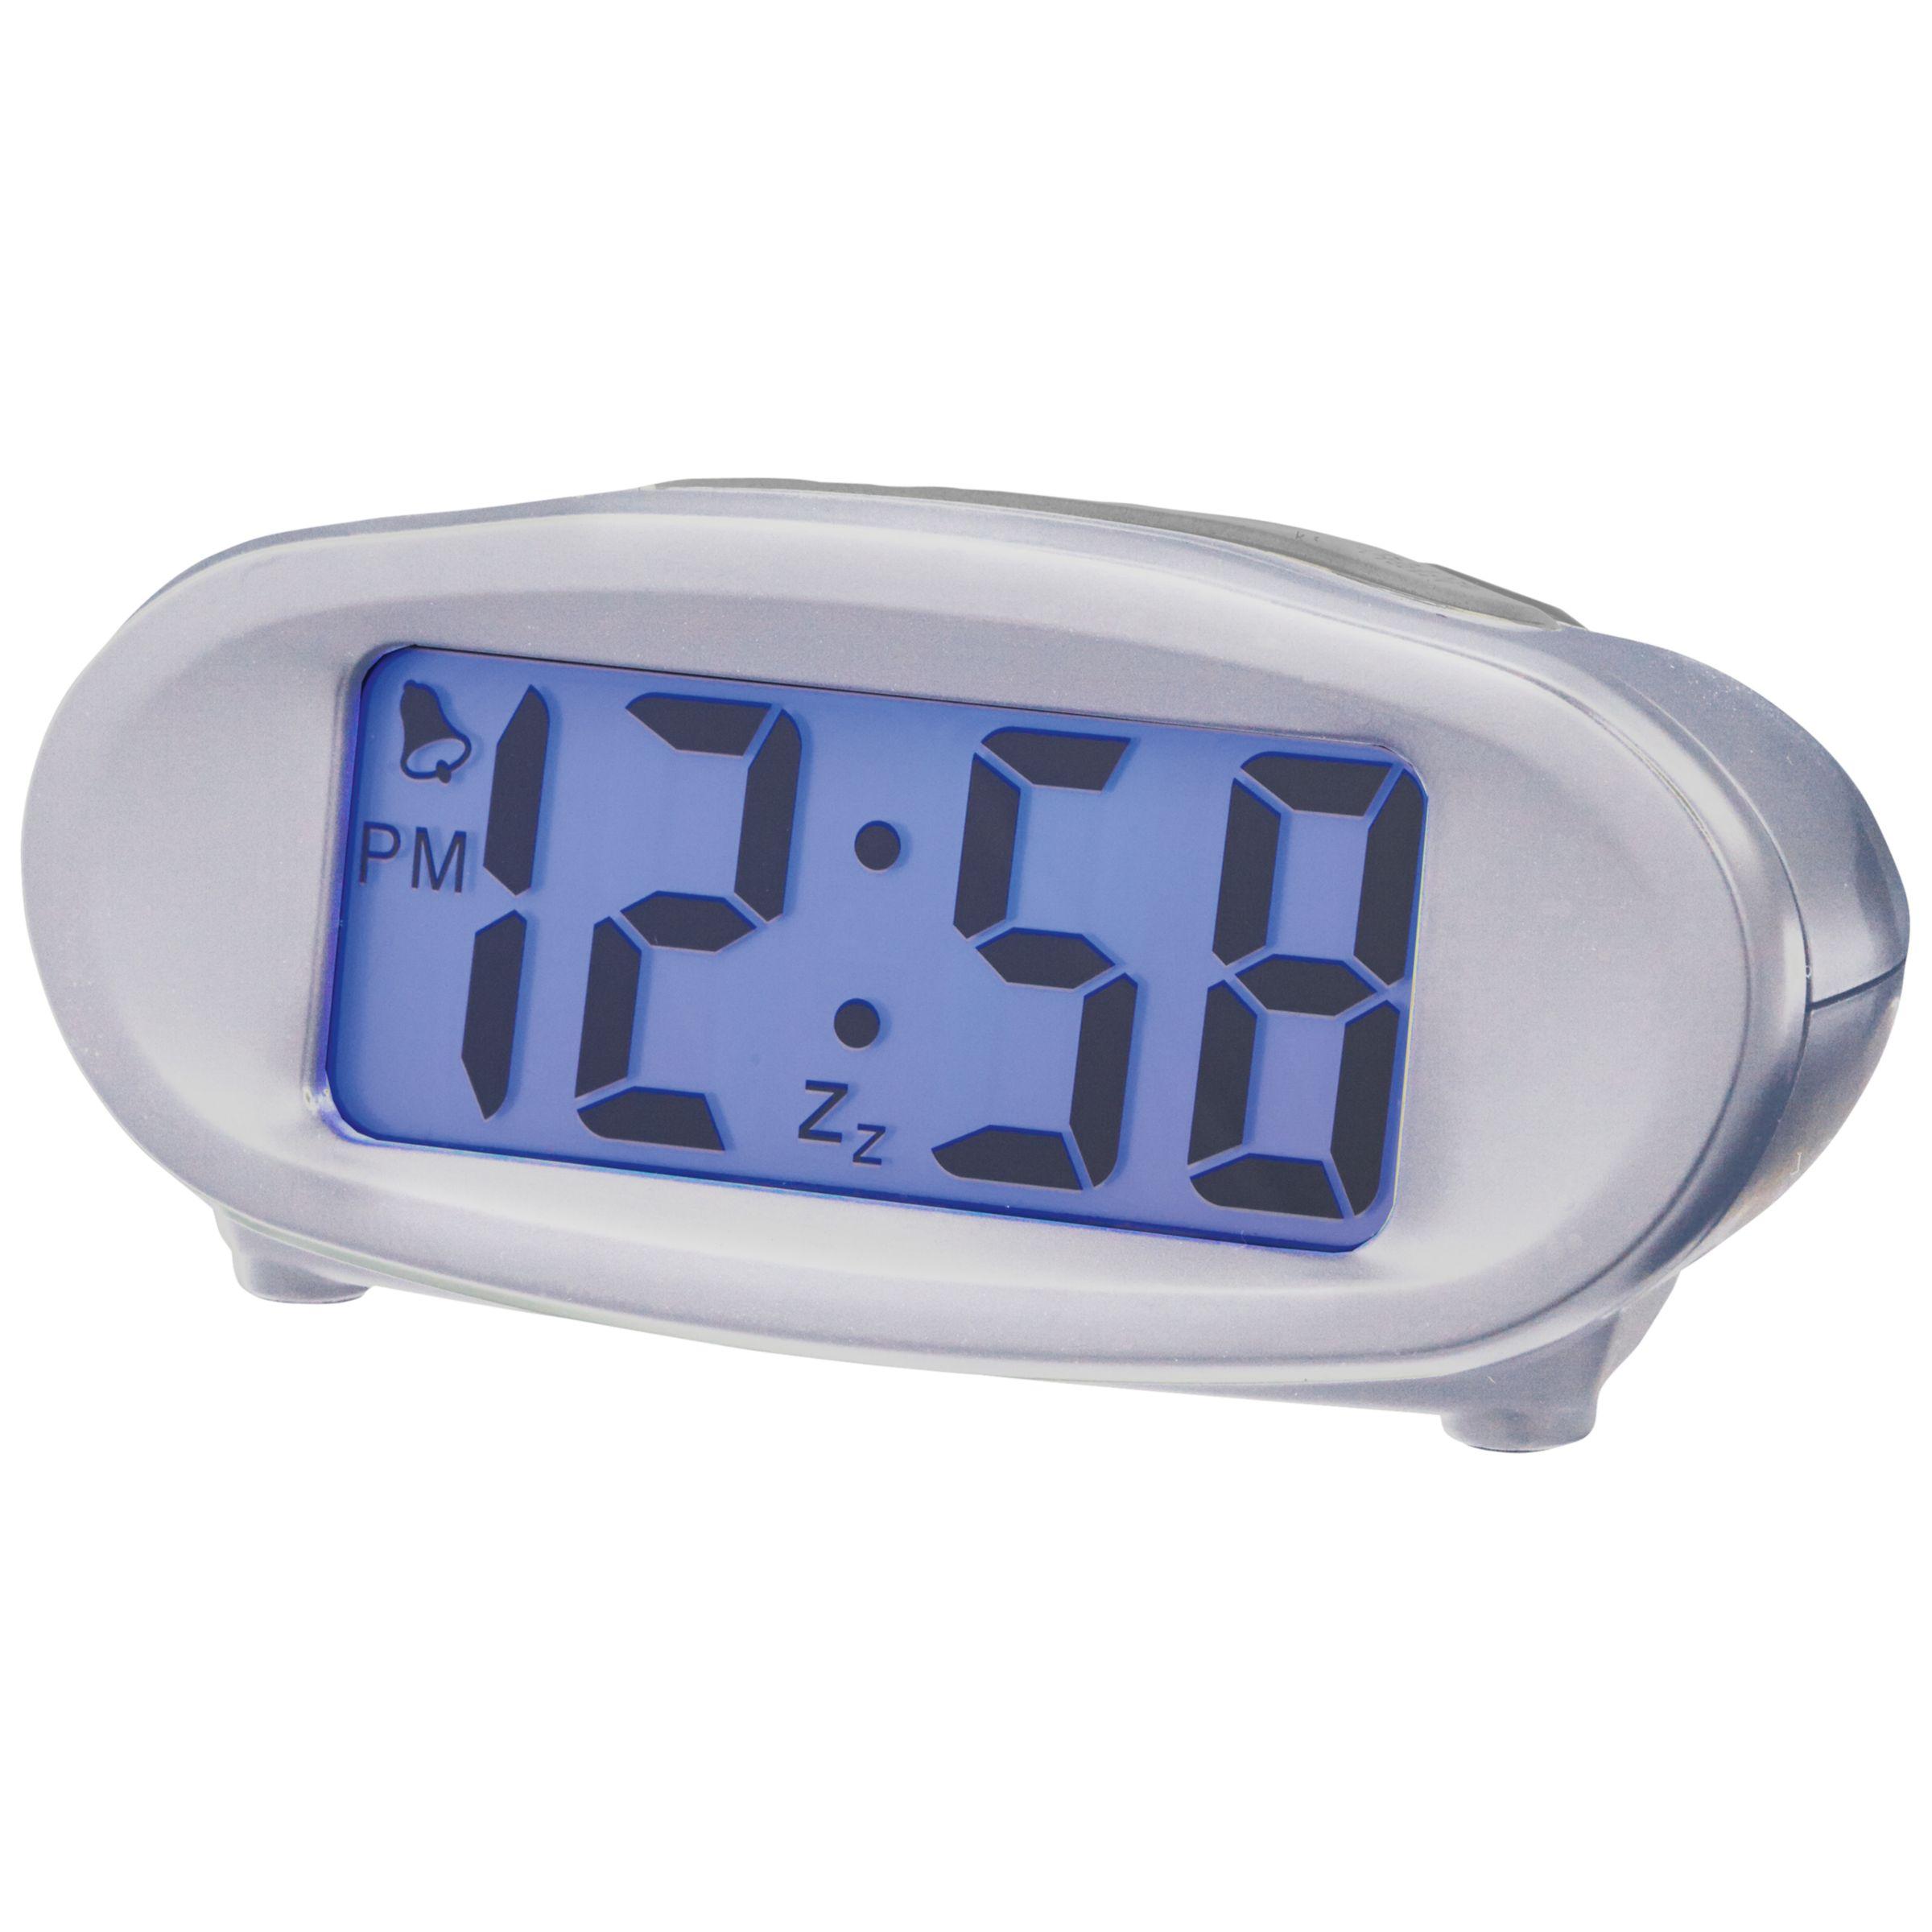 Acctim Acctim Eclipse Solar Alarm Clock, Silver